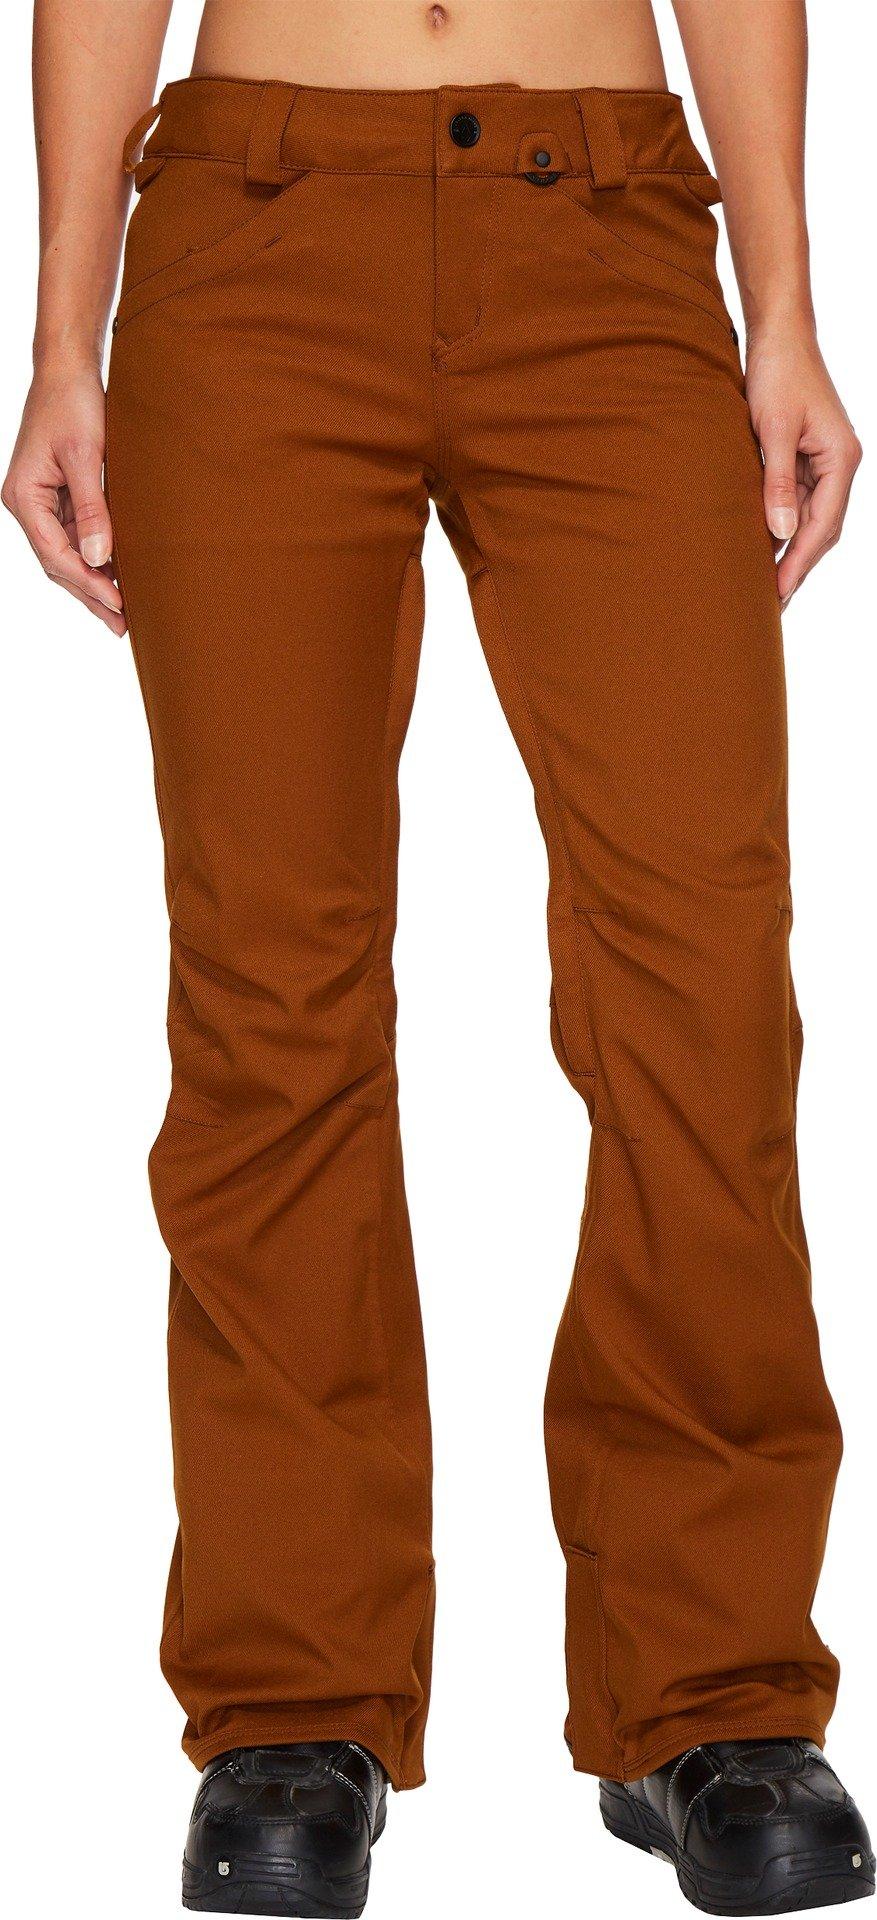 Volcom Snow Women's Species Stretch Pants Copper Small by Volcom